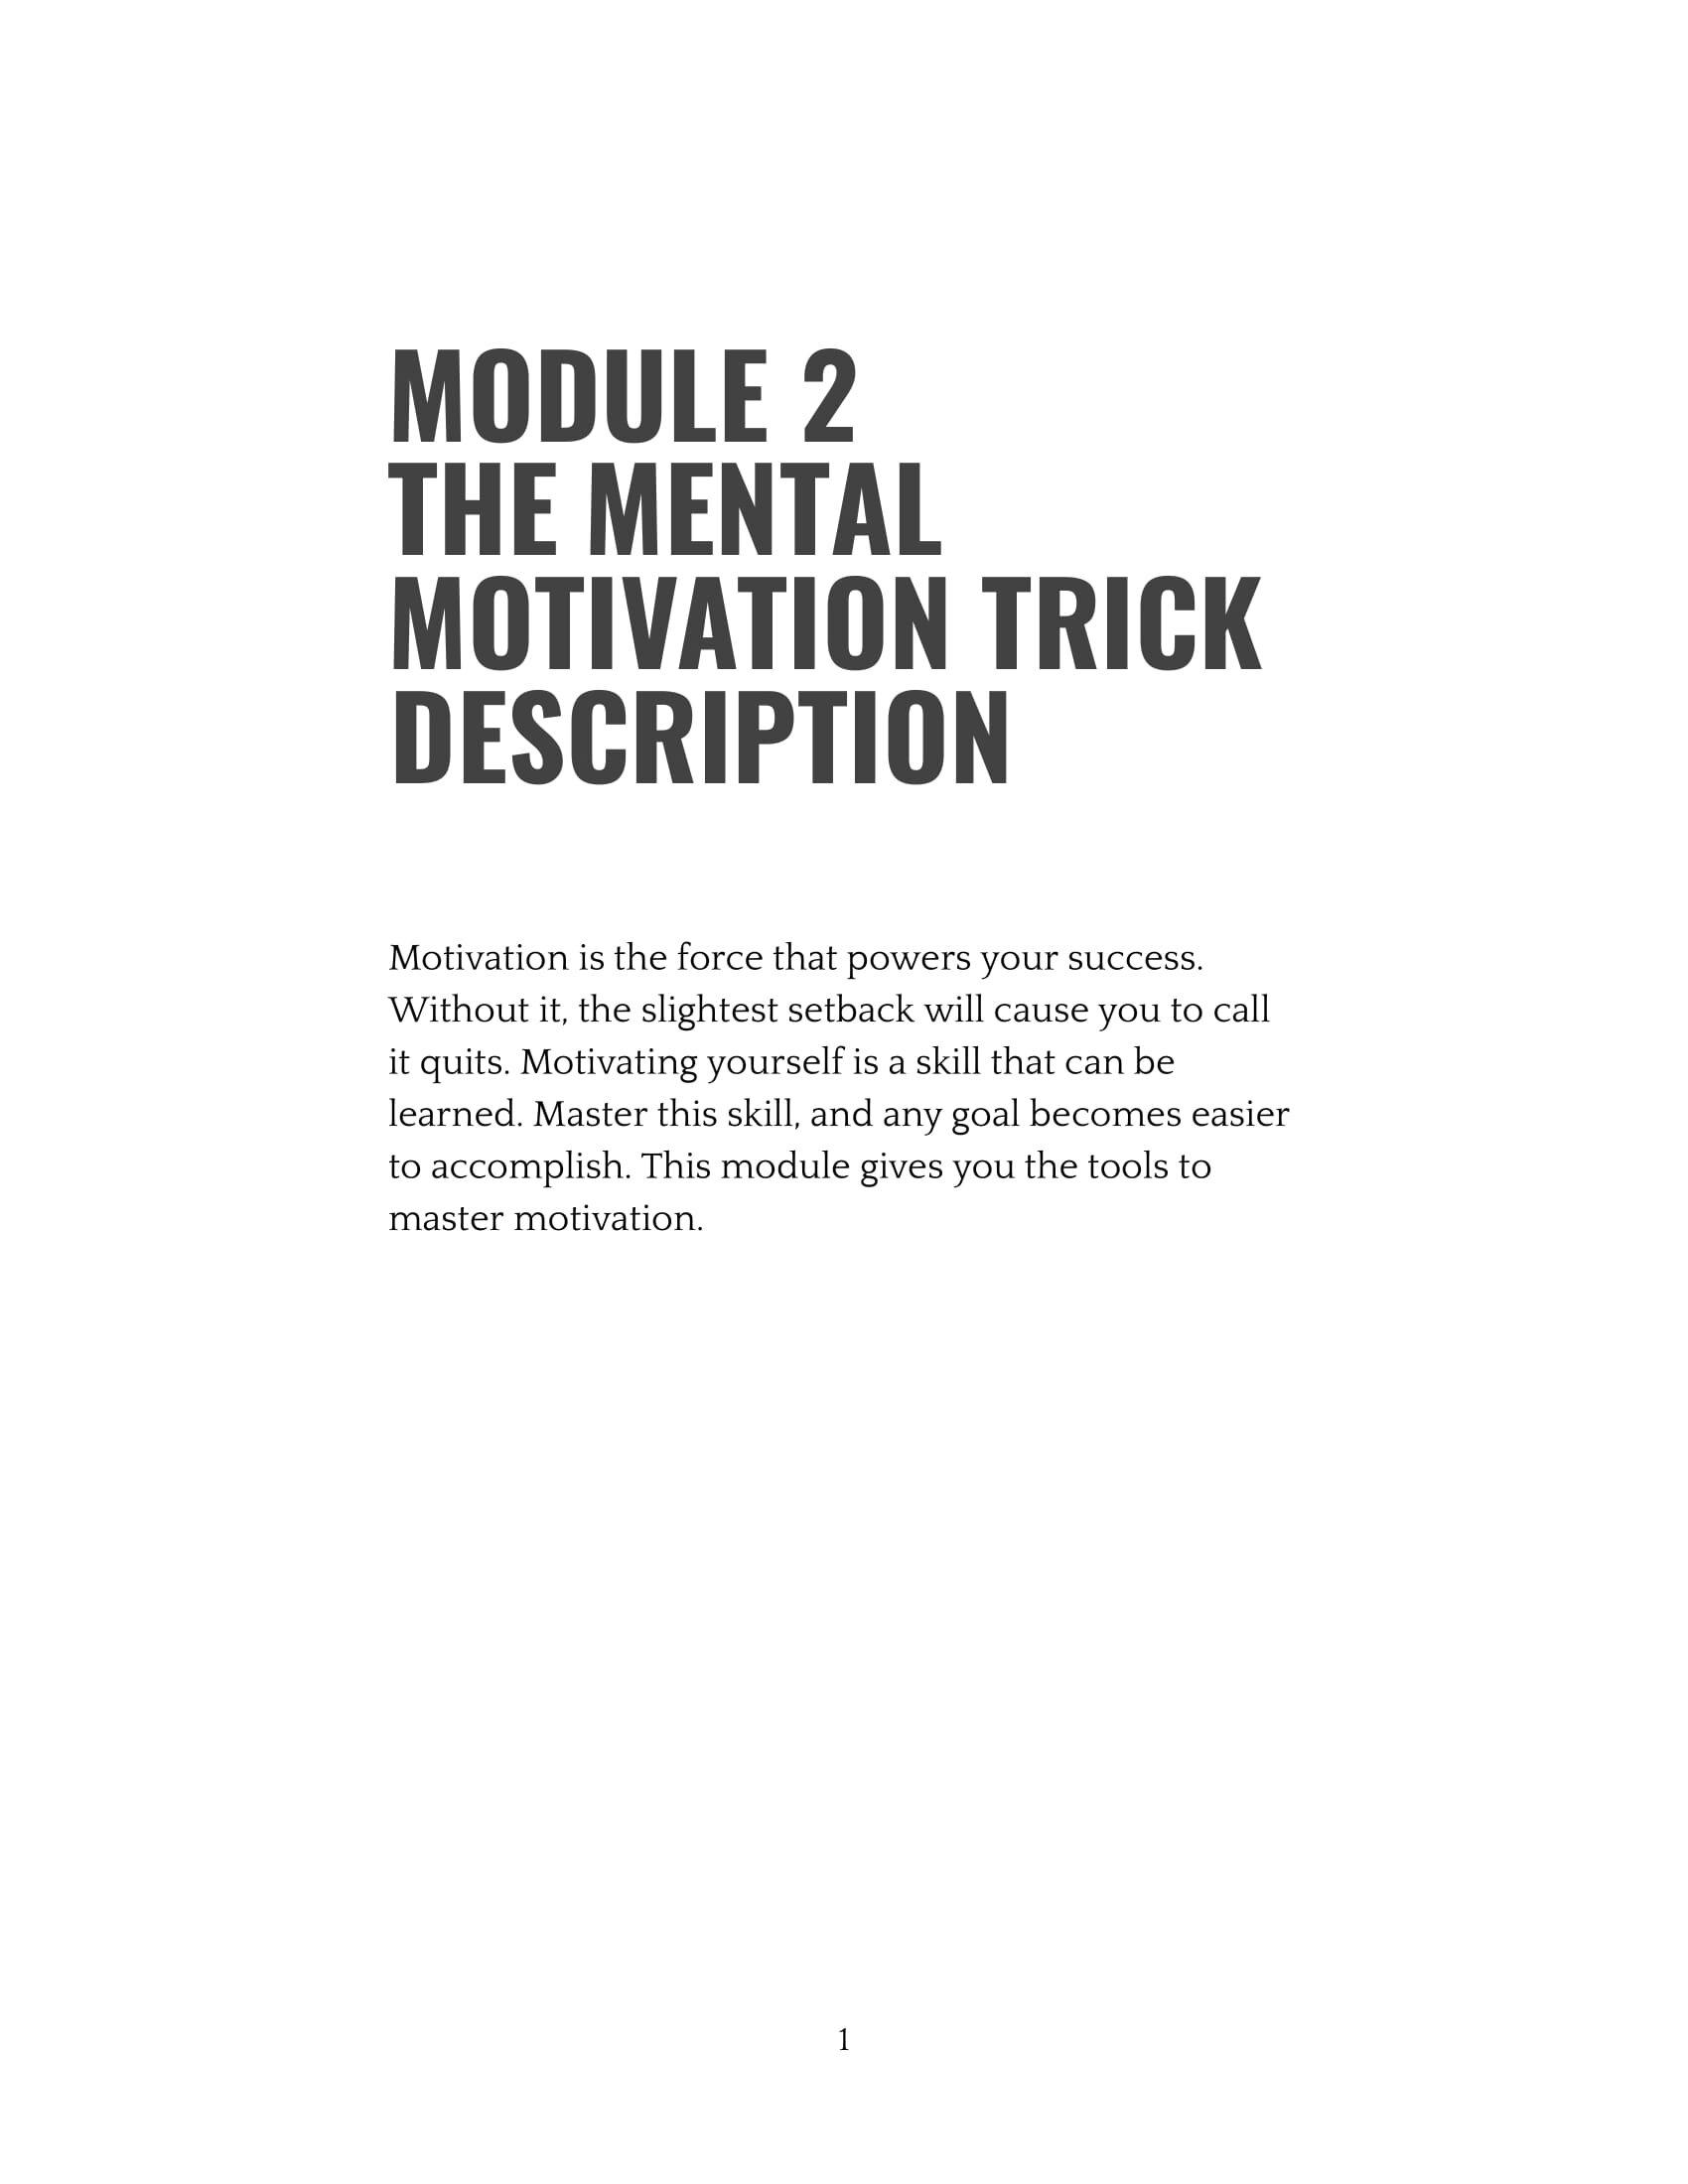 The Mental Motivation Trick Description-1.jpg